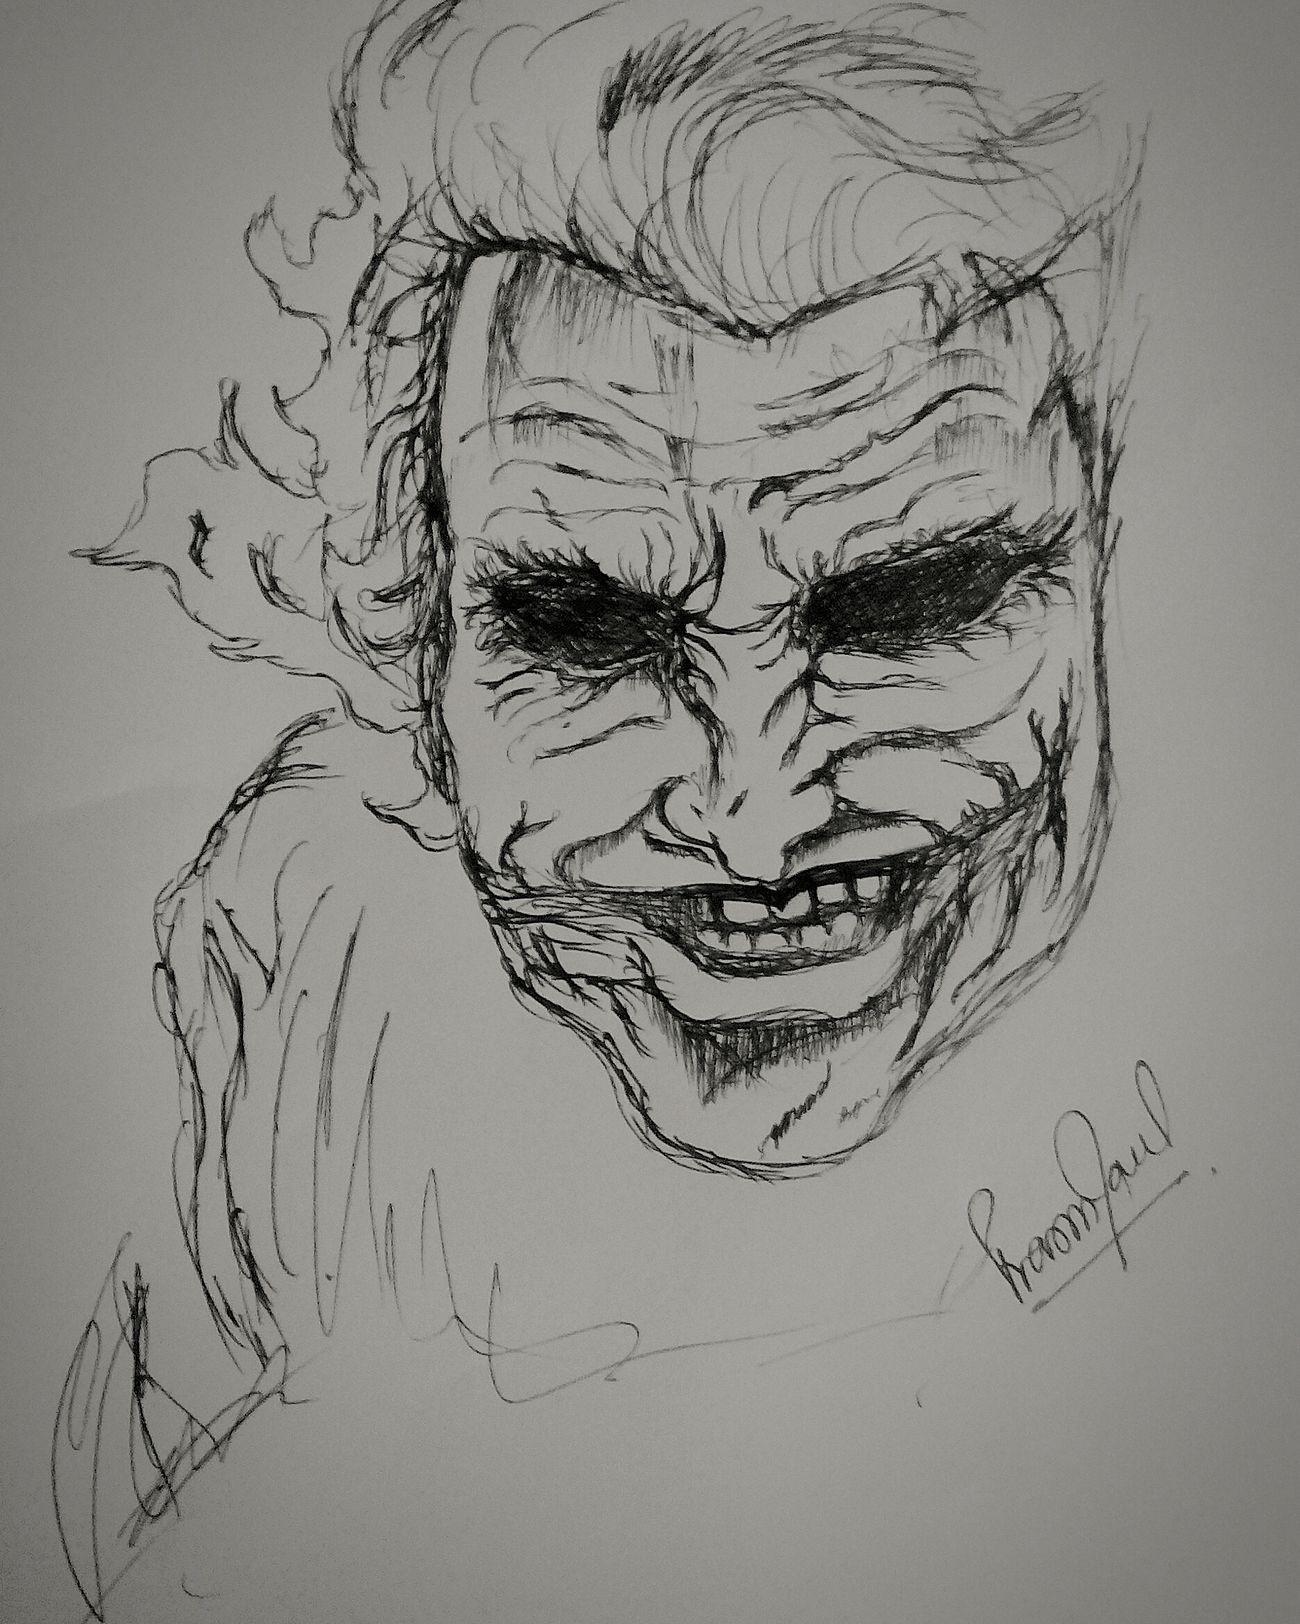 Sketching Joker Drawings Sketchoftheday